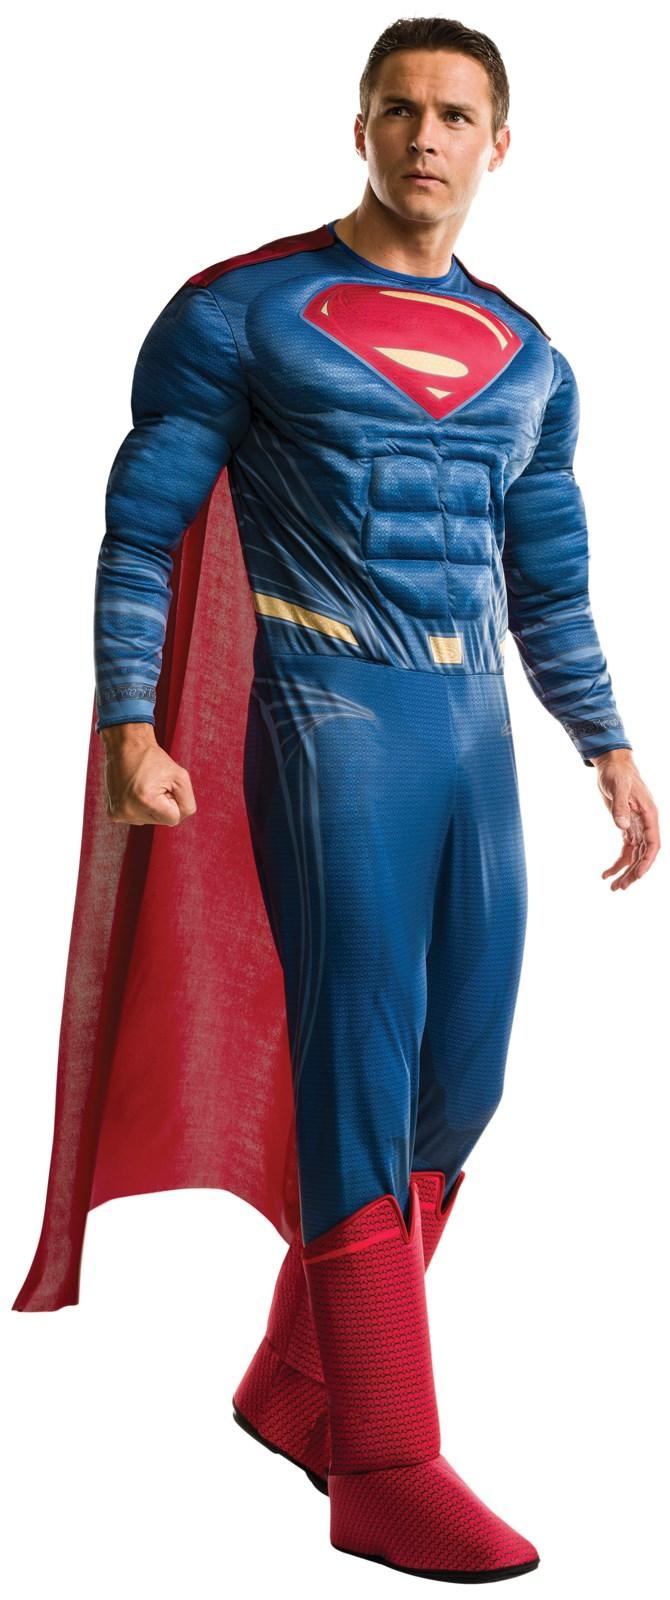 Halloween Costumes For Men | BuyCostumes.com